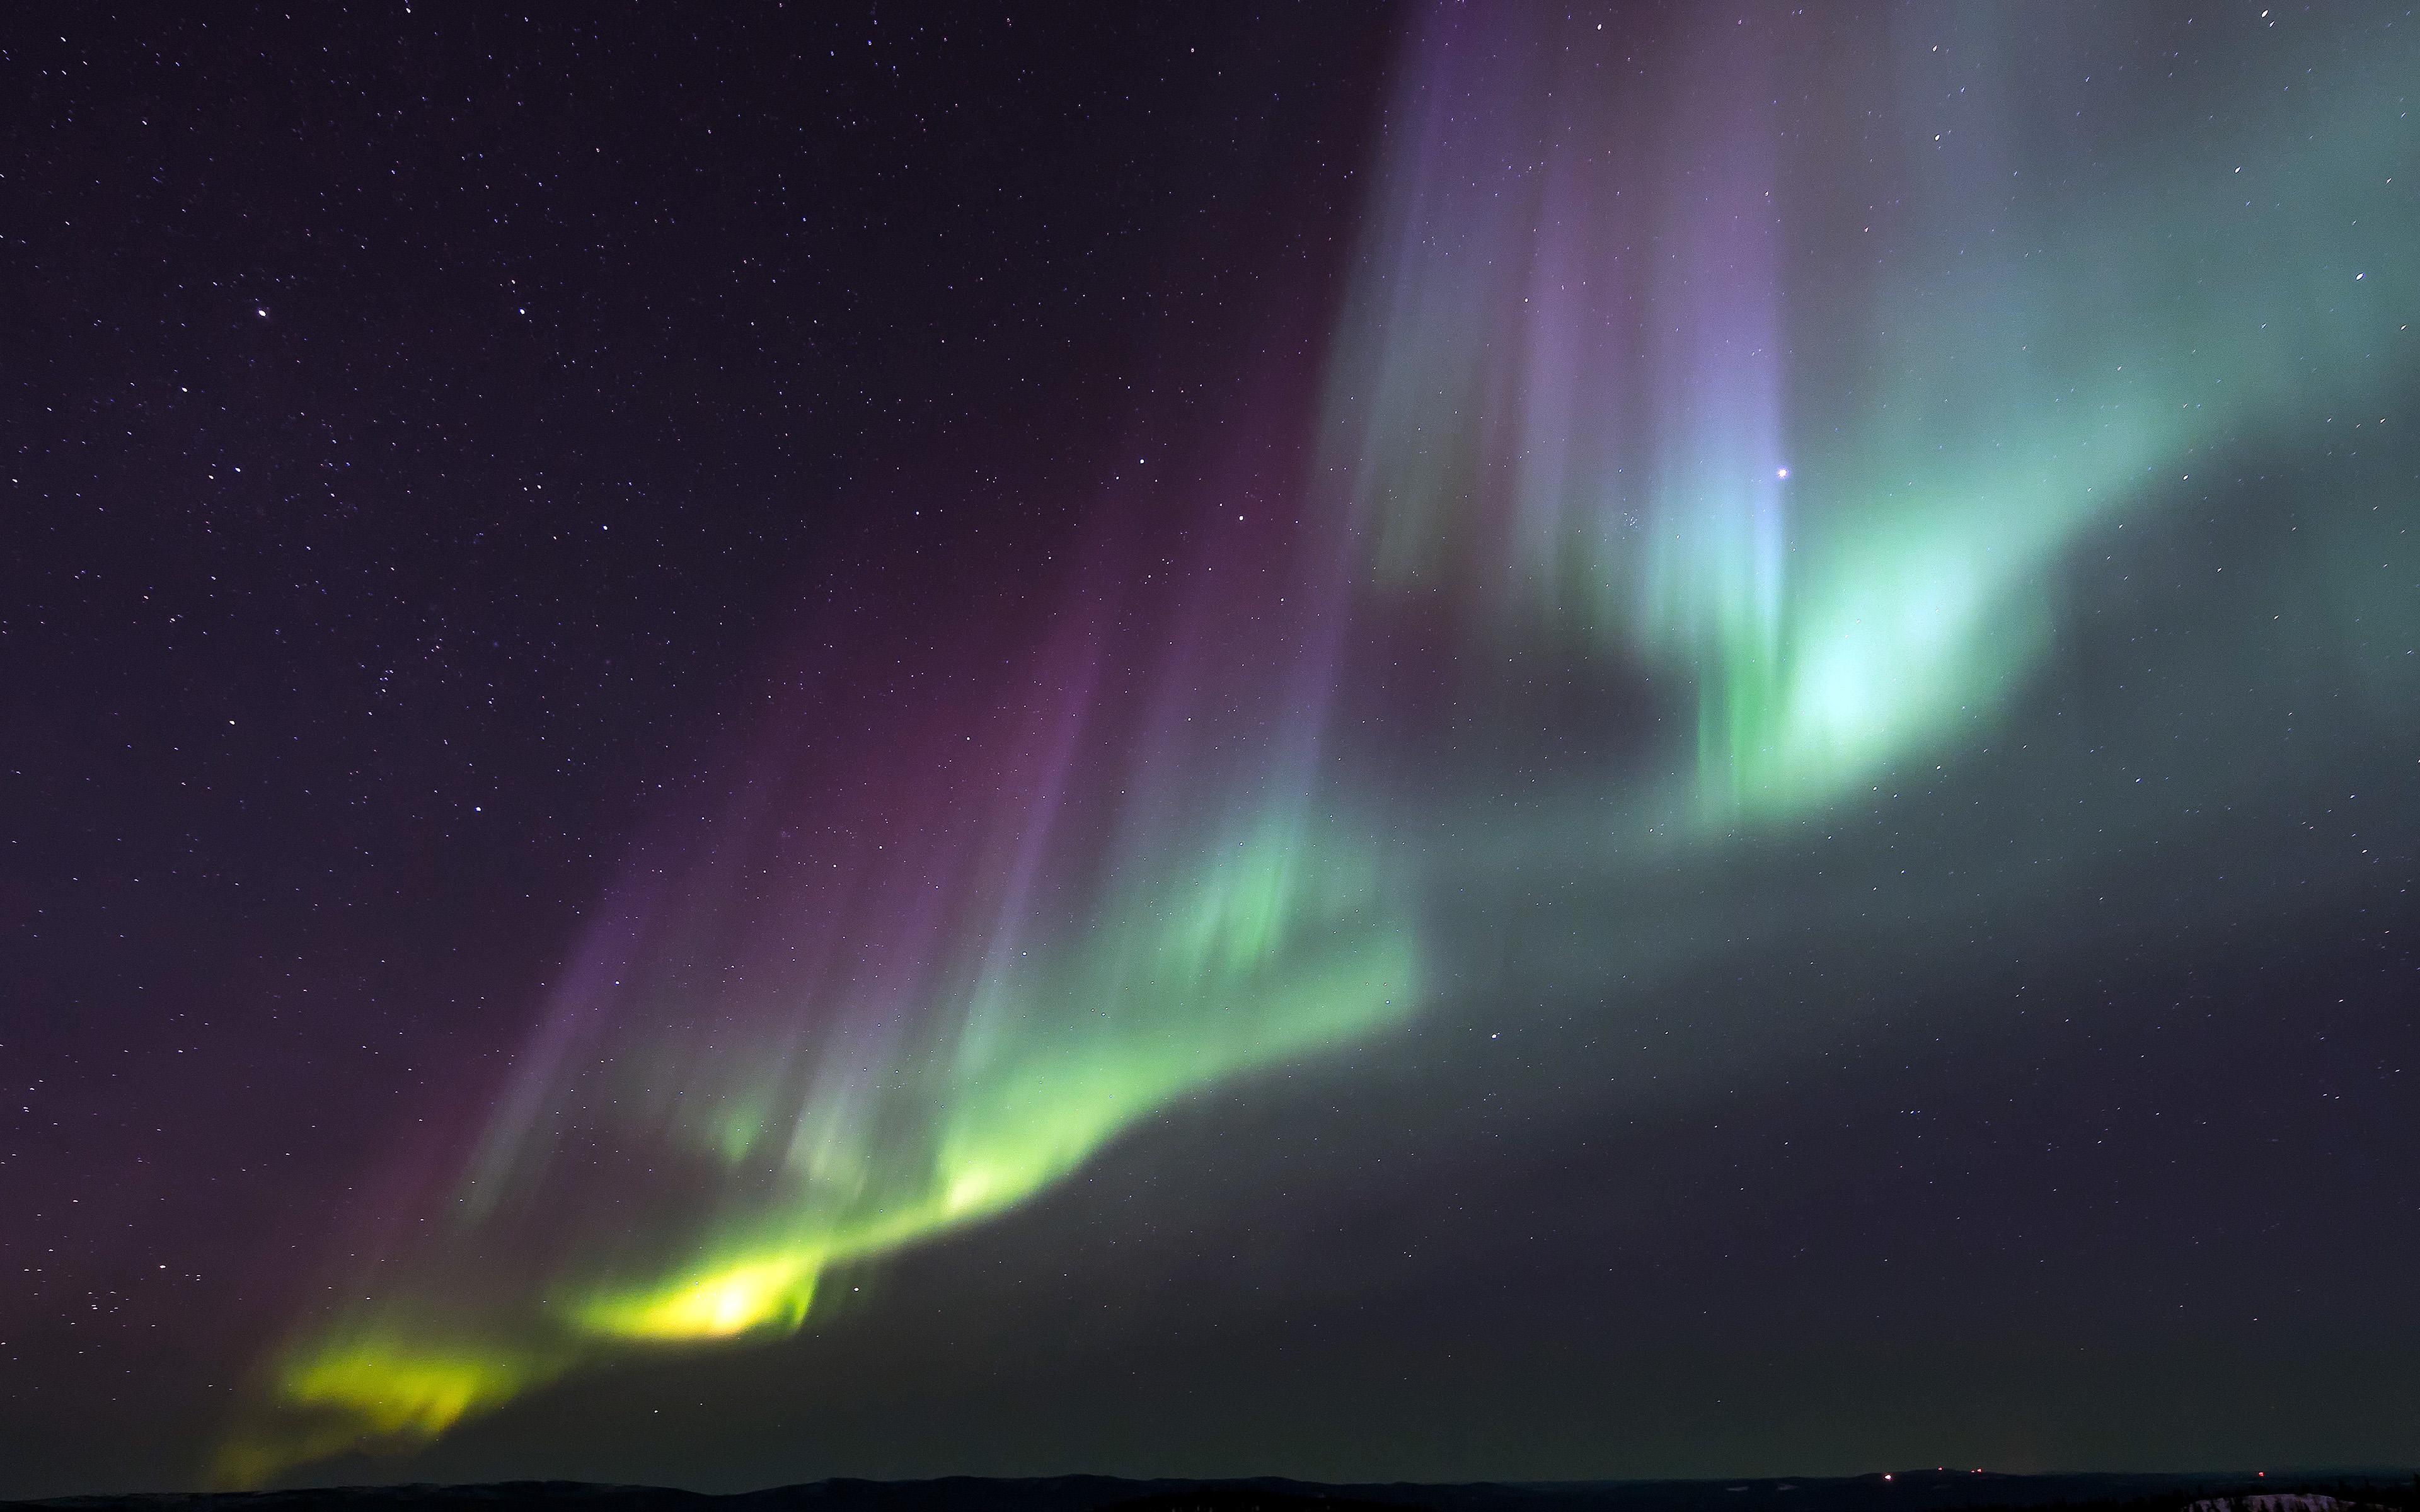 Nj73 Aurora Night Sky Awesome Beautiful Color Wallpaper